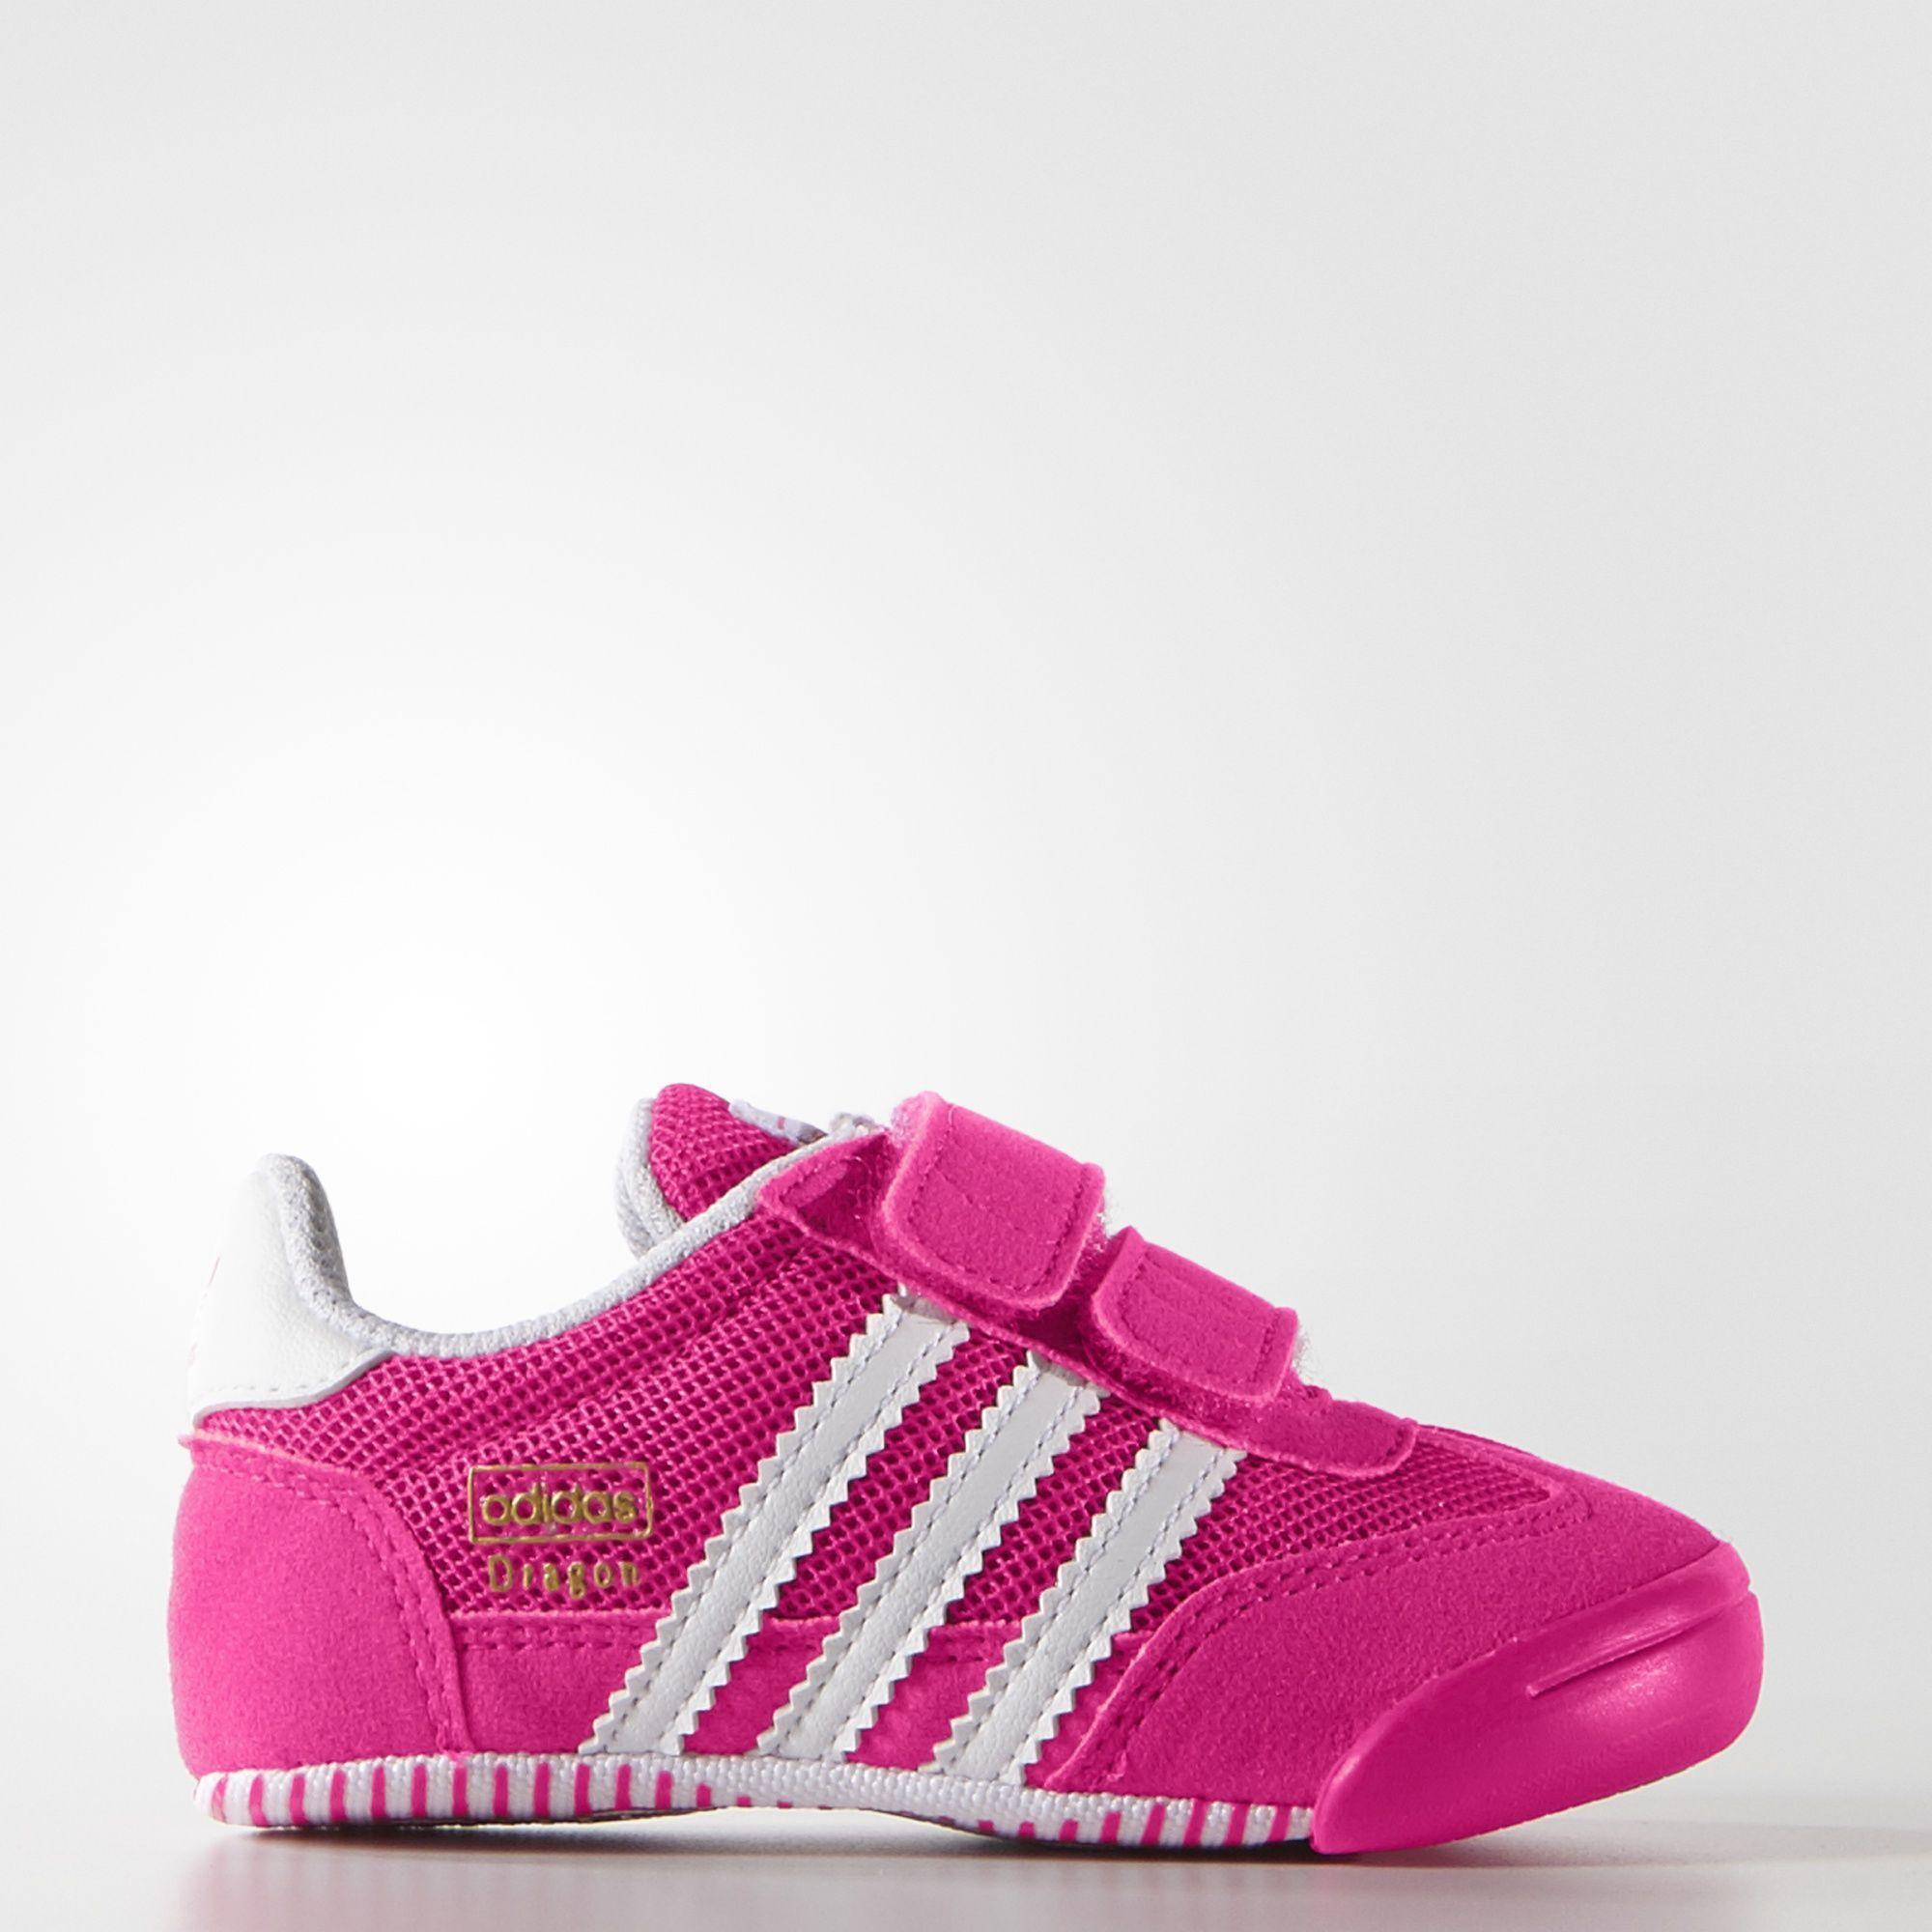 Access Denied | Adidas, Schuhe für männer, Sneaker